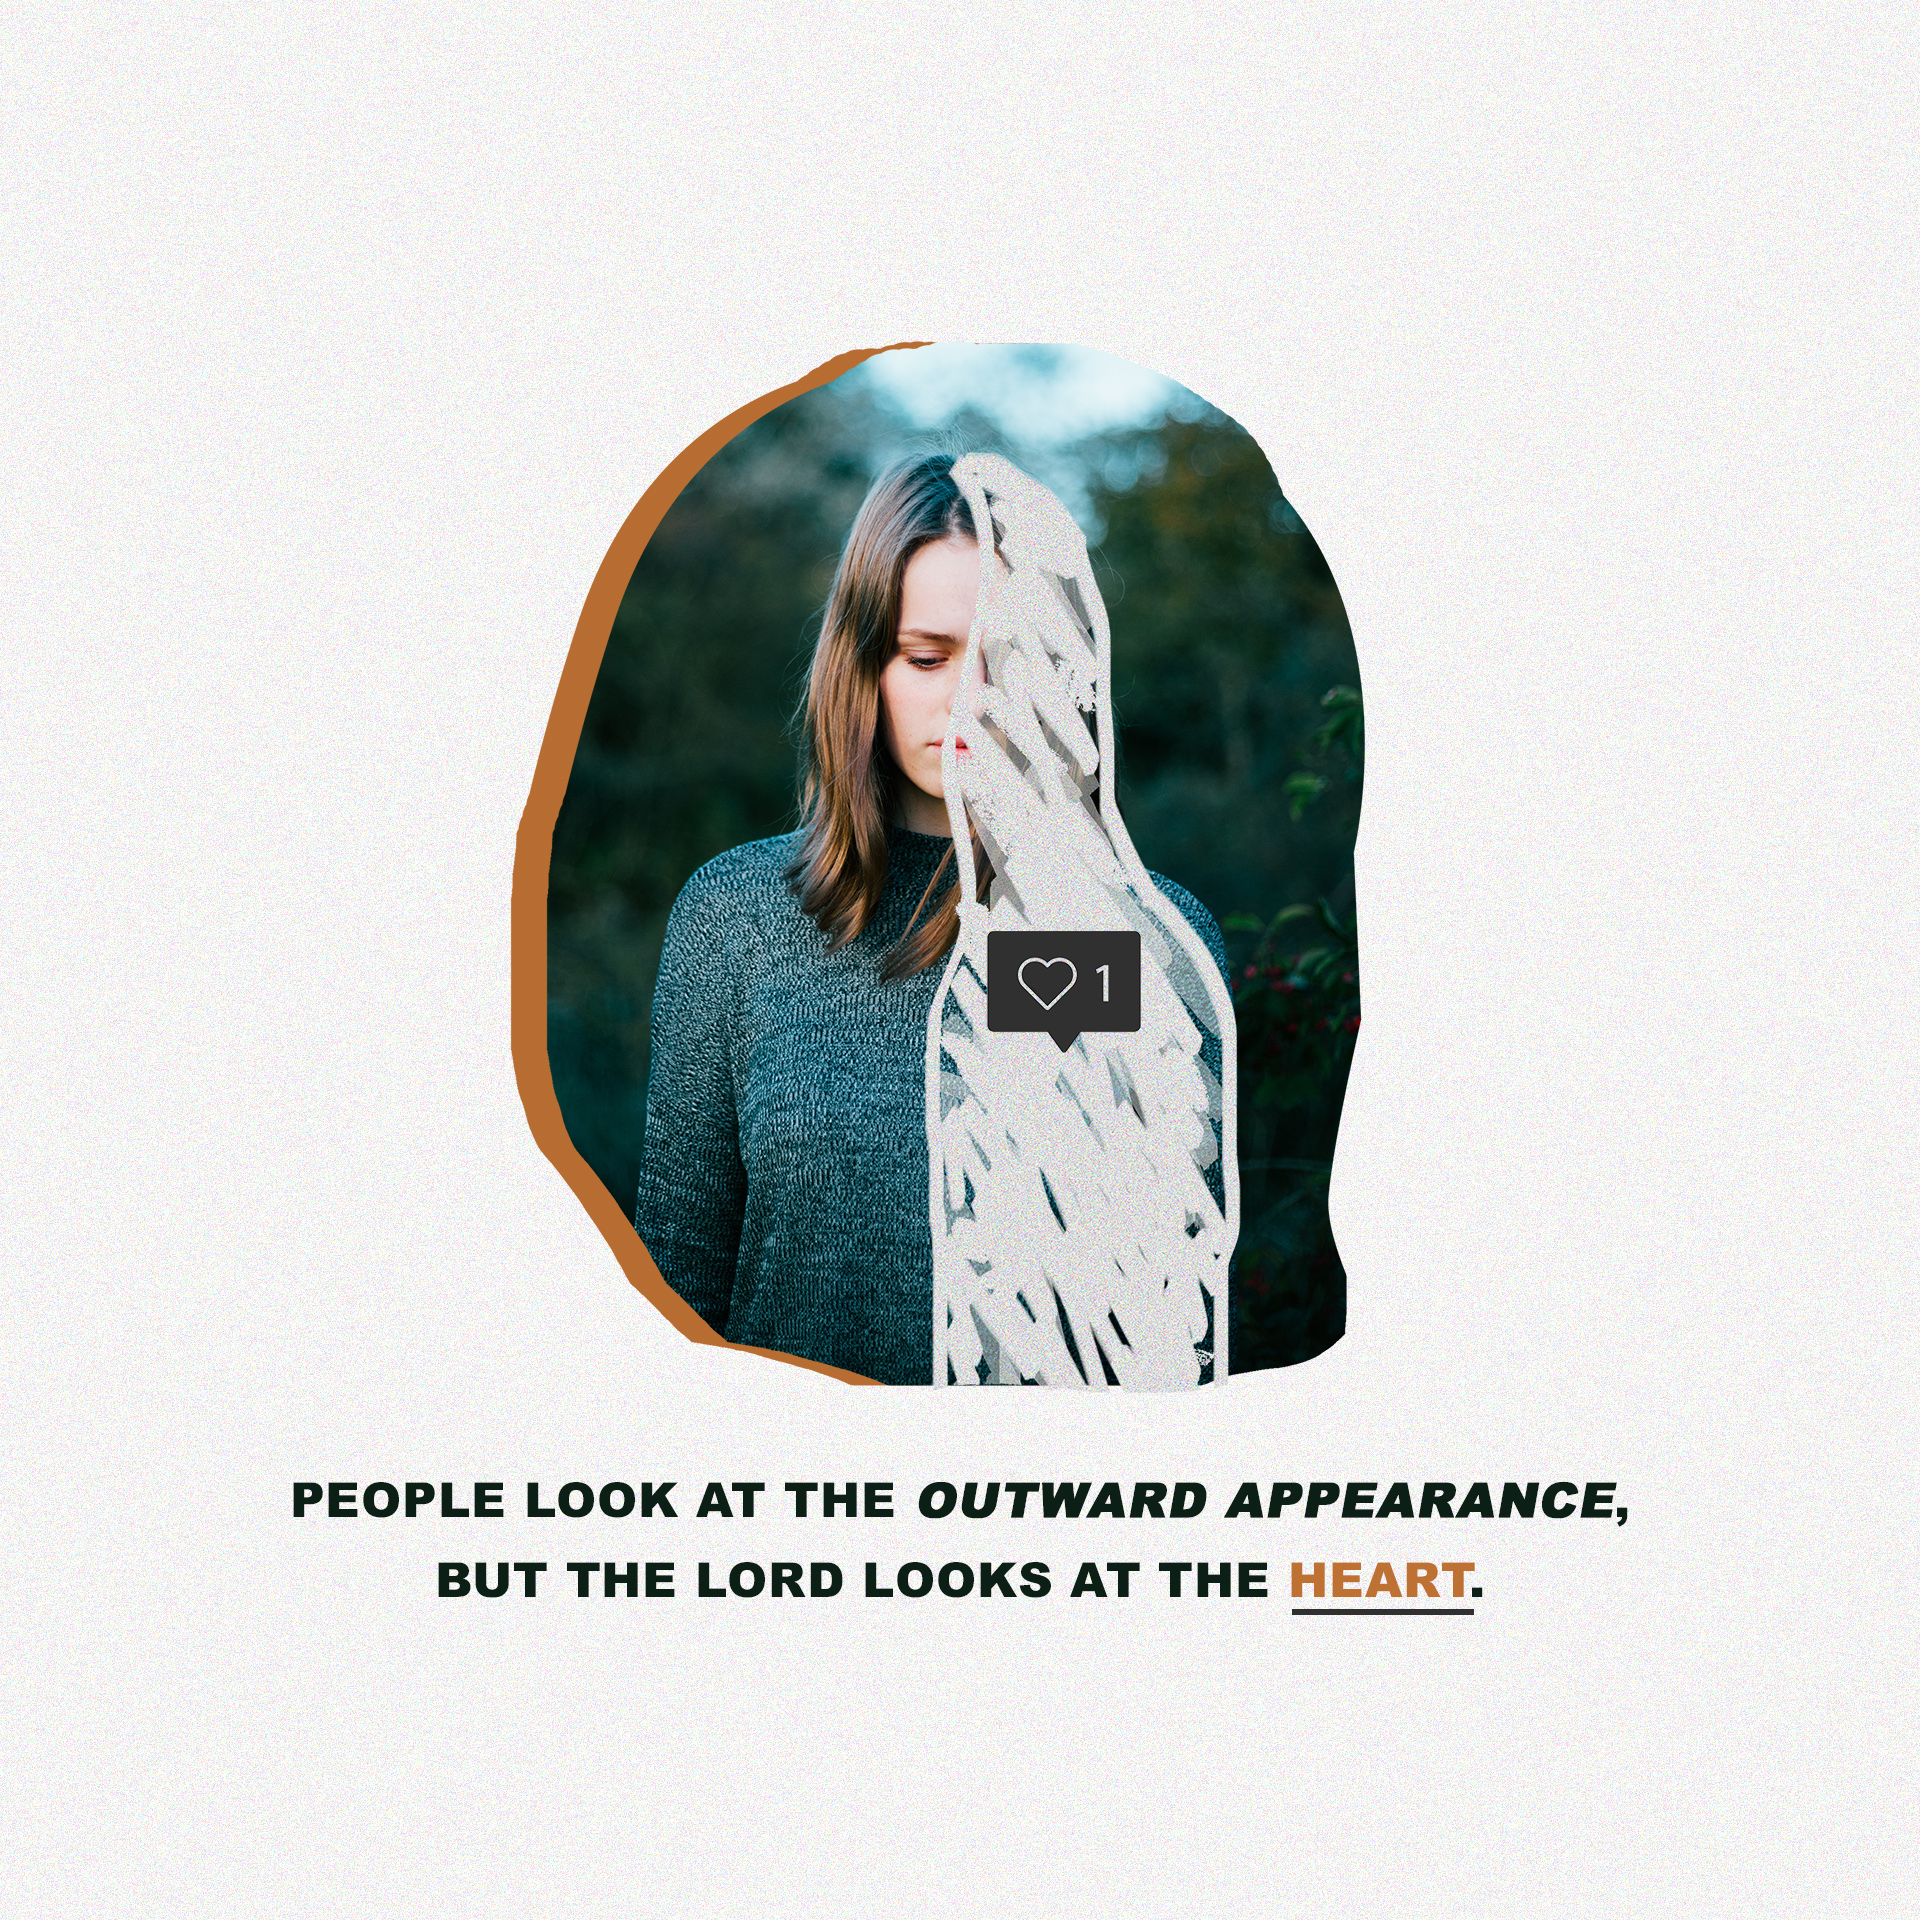 appearance_lowerquality.jpg